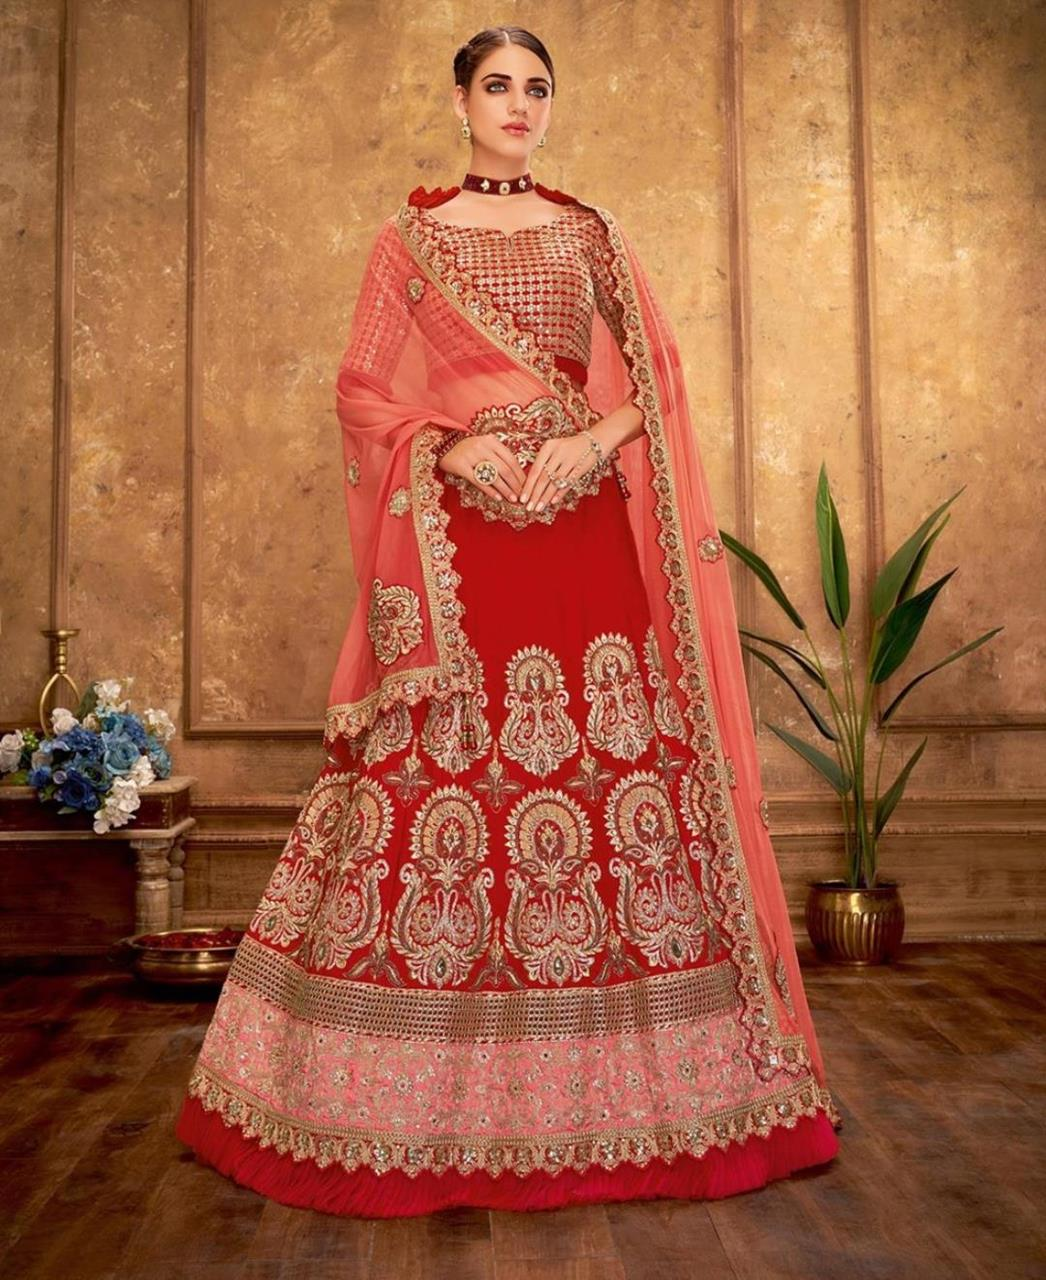 Embroidered Silk Red Circular Lehenga Choli